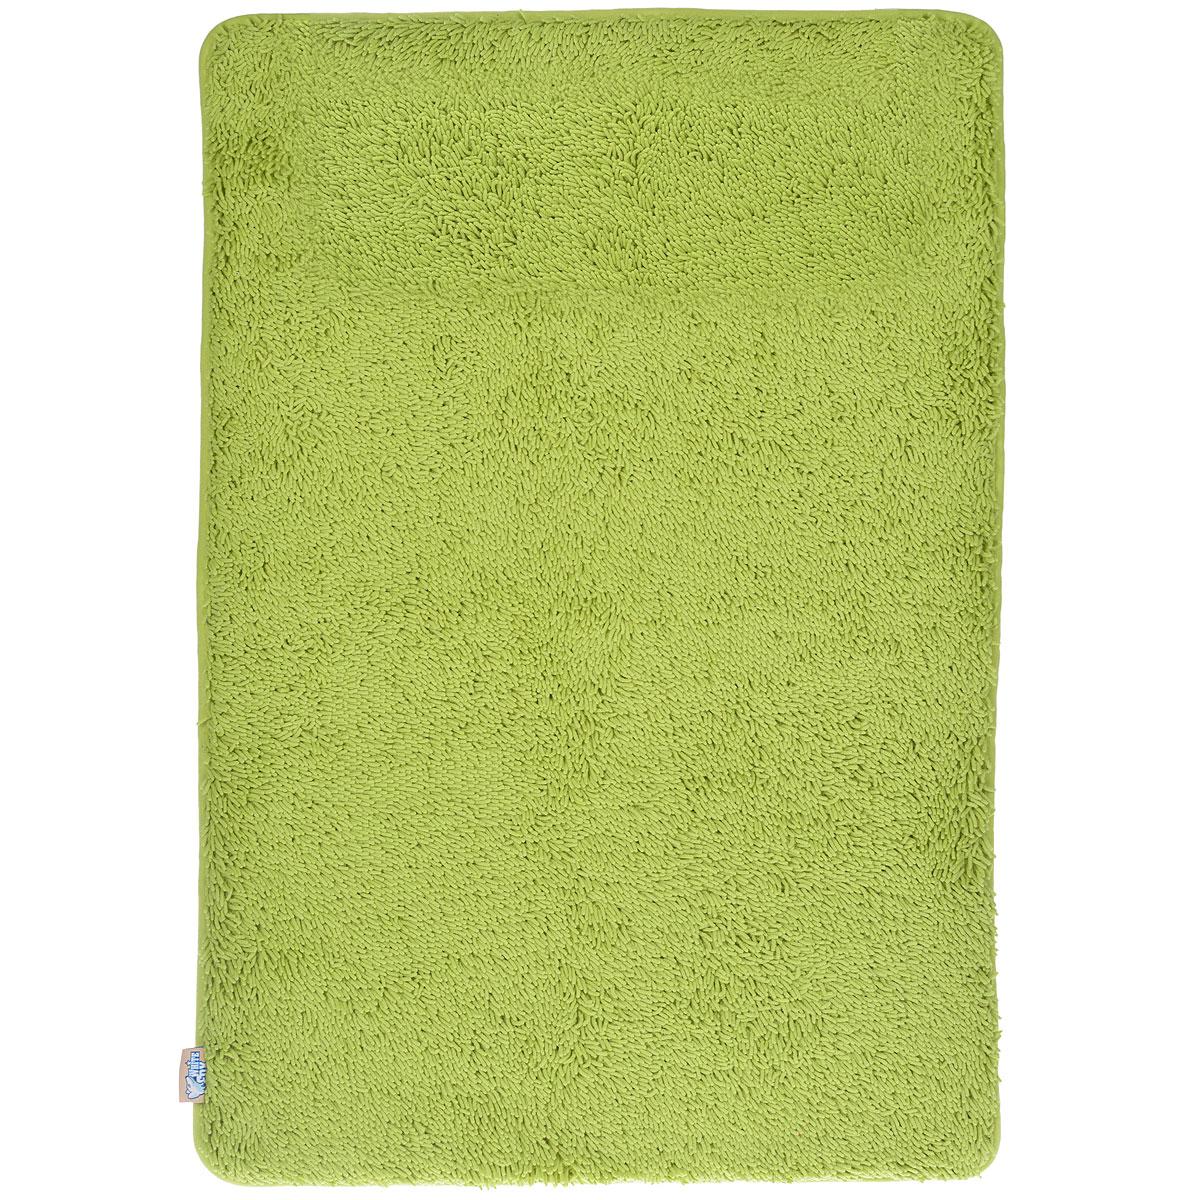 "Коврик для ванной White Fox ""Relax"", цвет: зеленый, 60 см х 90 см"